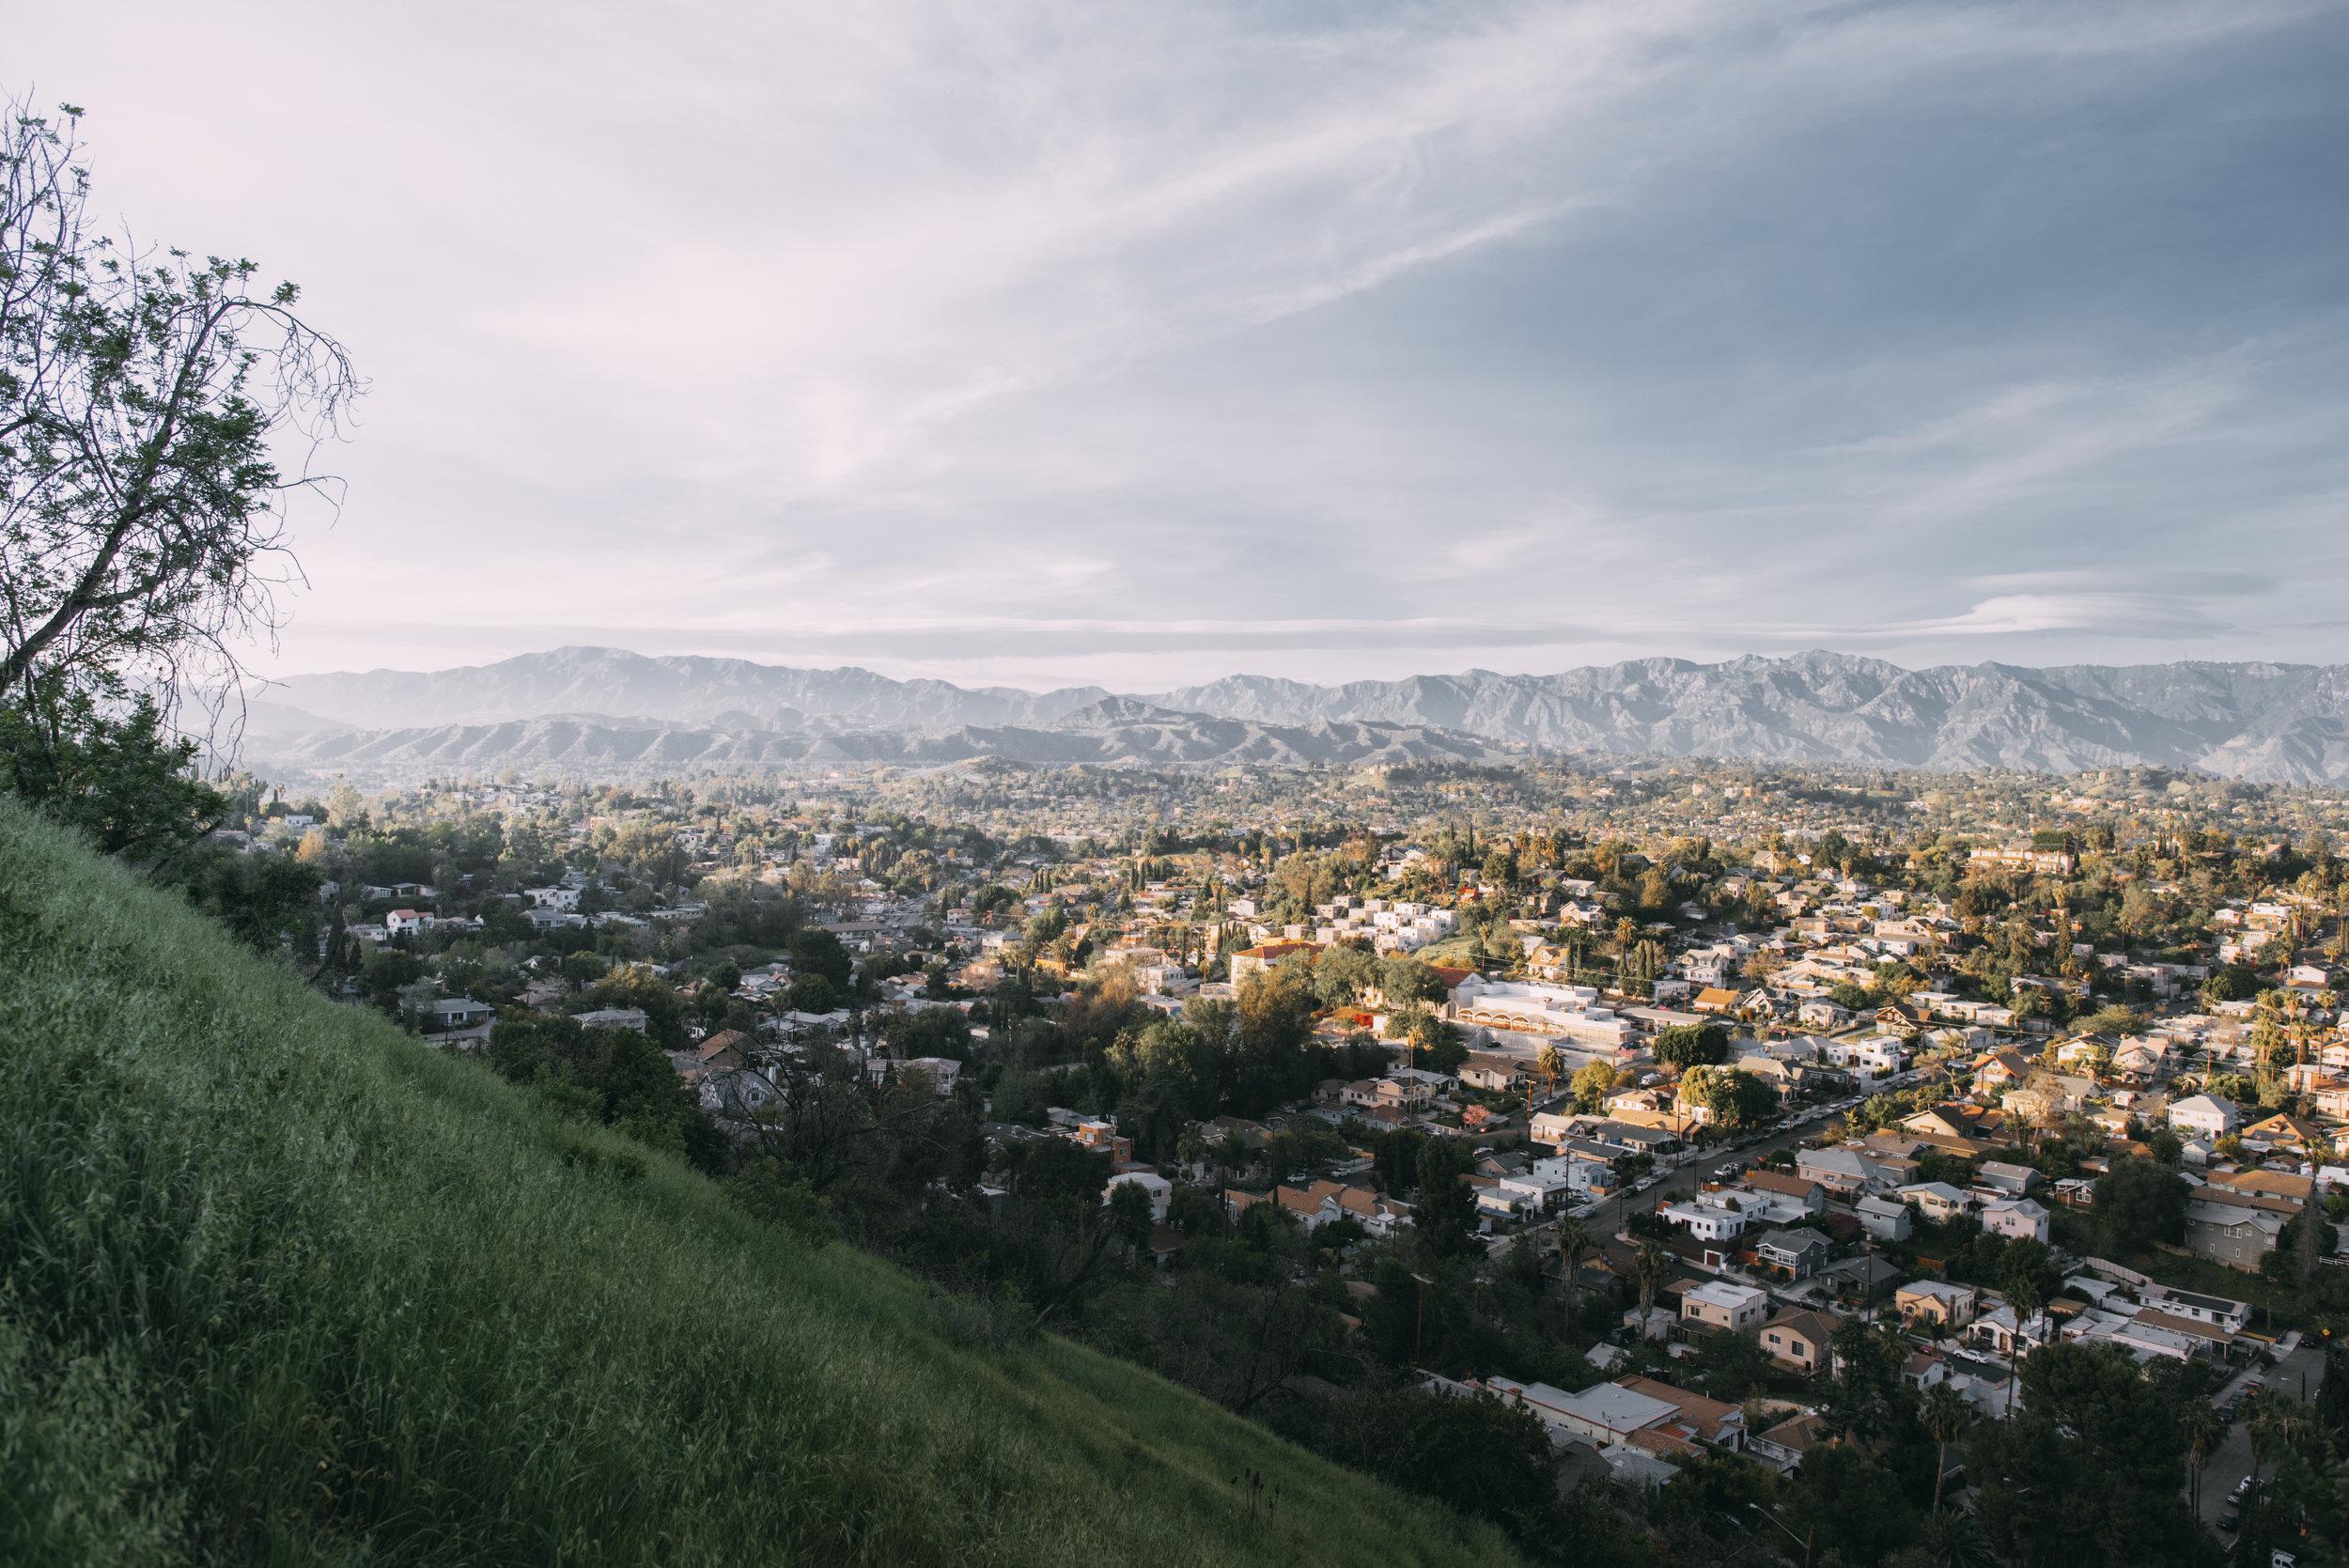 Highland Park, Los Angeles, California